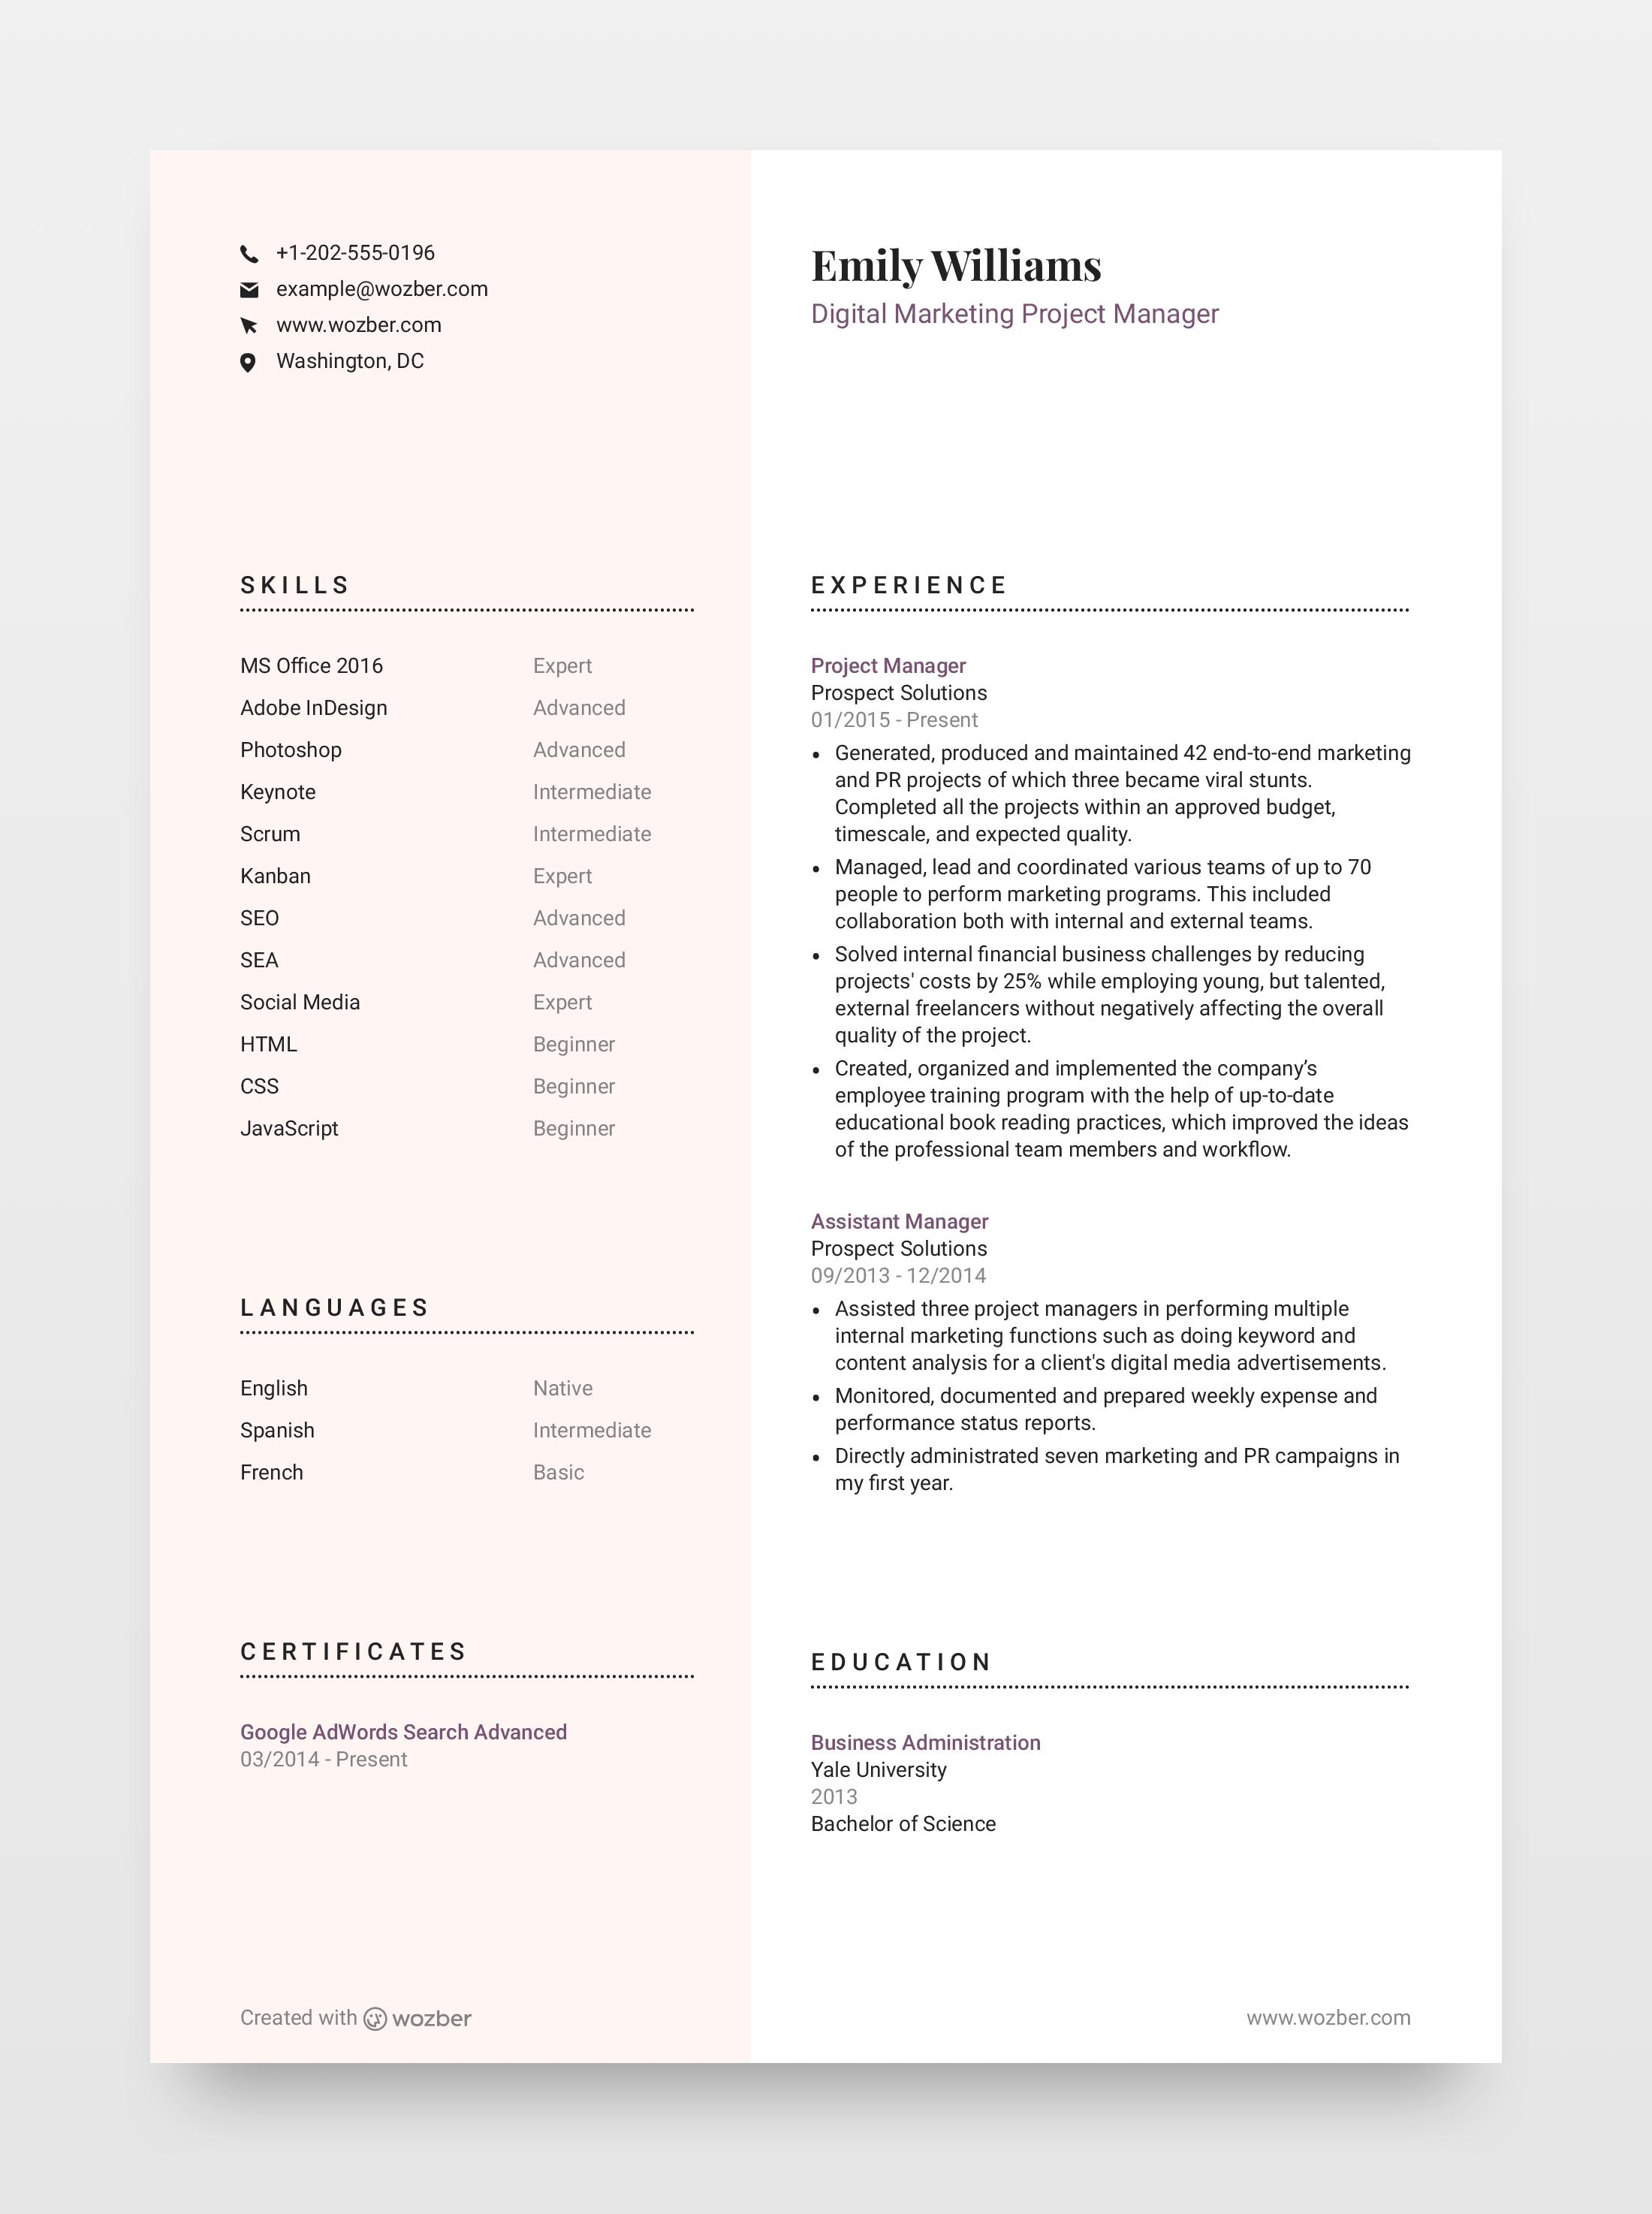 Modern, minimalistic, customizable resume template